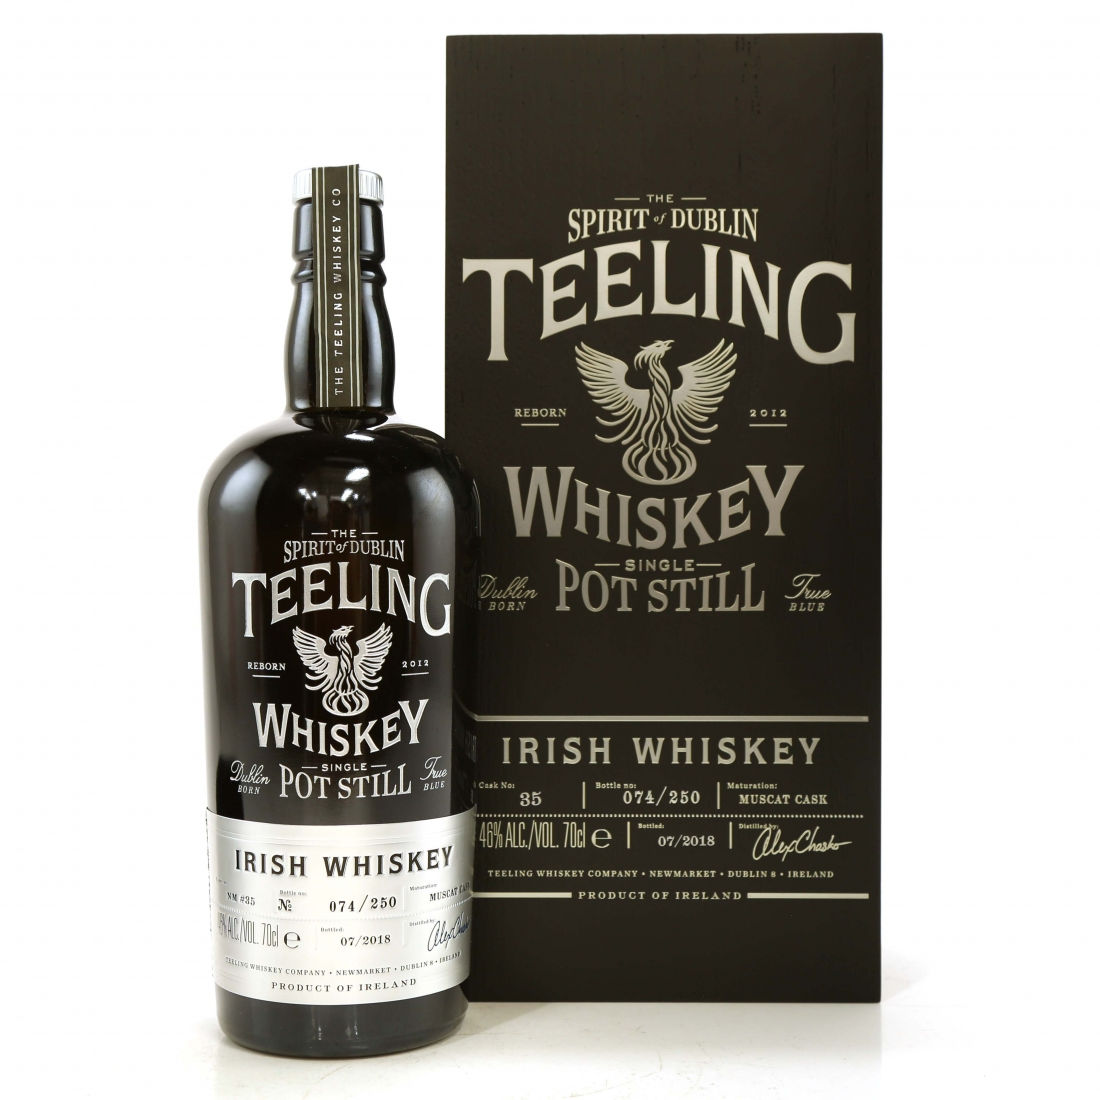 Teeling Celebratory Single Pot Still Whiskey / Bottle #074